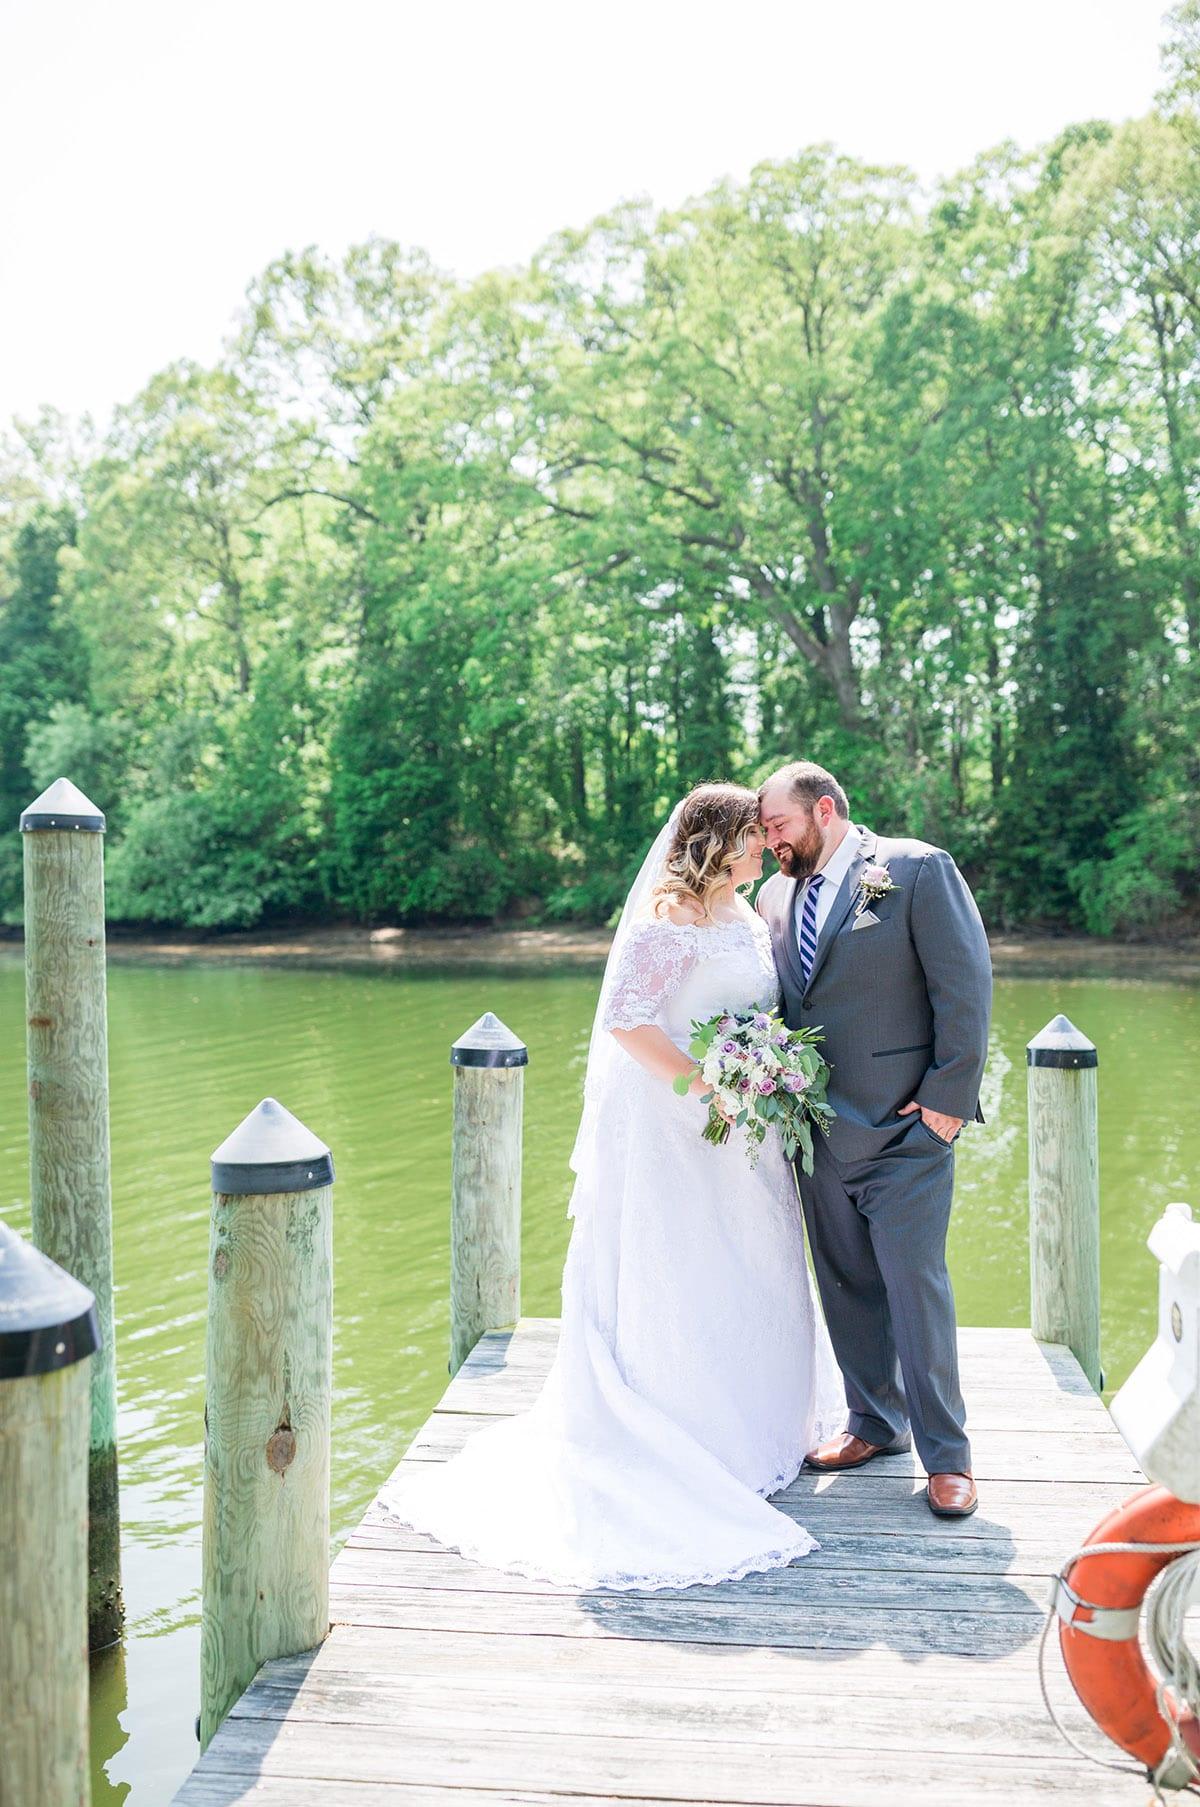 web-mrandmrs-dianatyler-wedding-cassidymrphotography-2